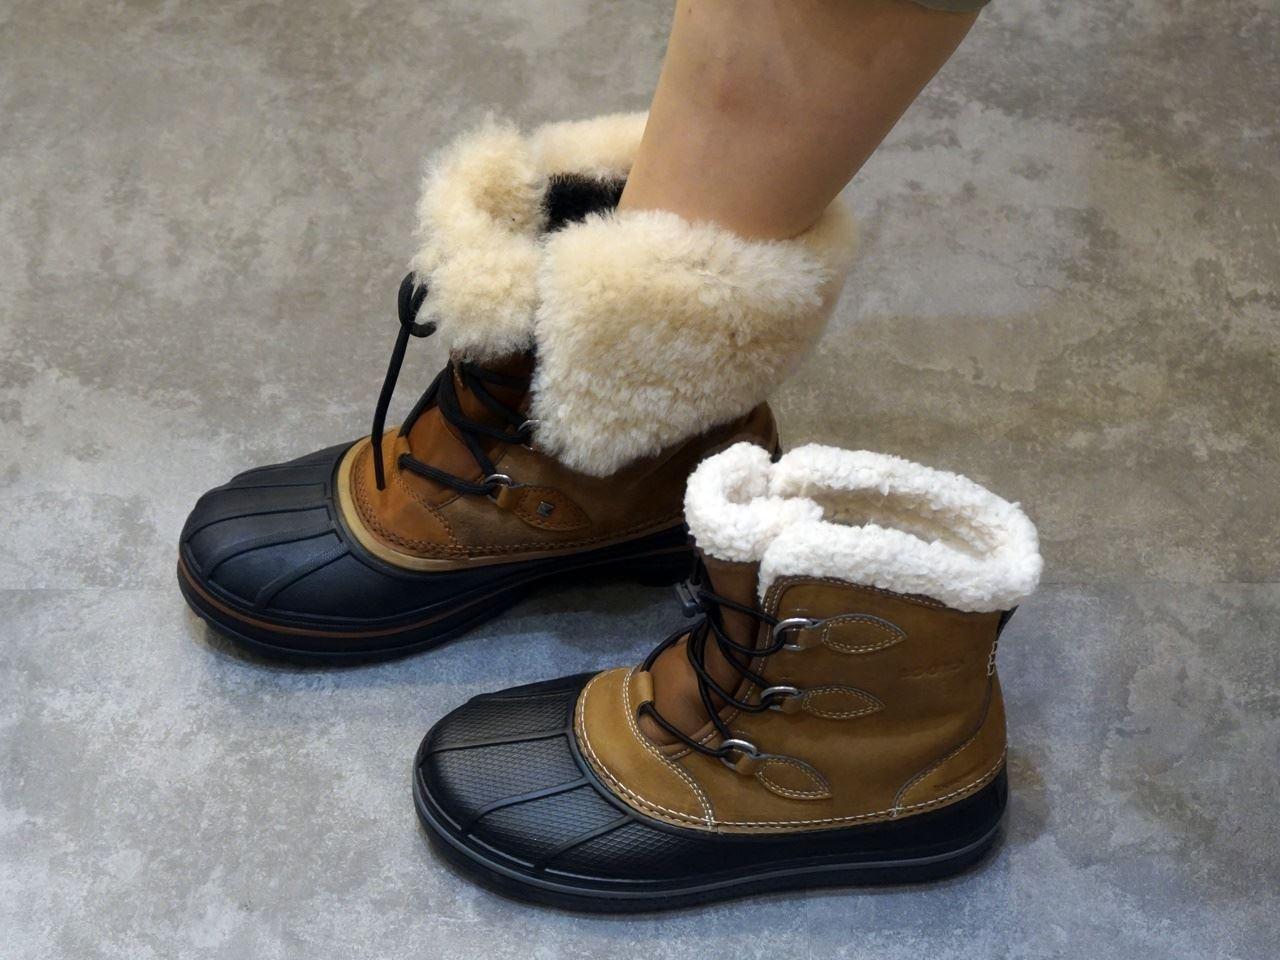 【Crocs】allcast 2.0 luxe boot w オールキャスト 2.0 ラックス ブーツ ウィメン & allcast 2.0 boot kids オールキャスト 2.0 ブーツ キッズ